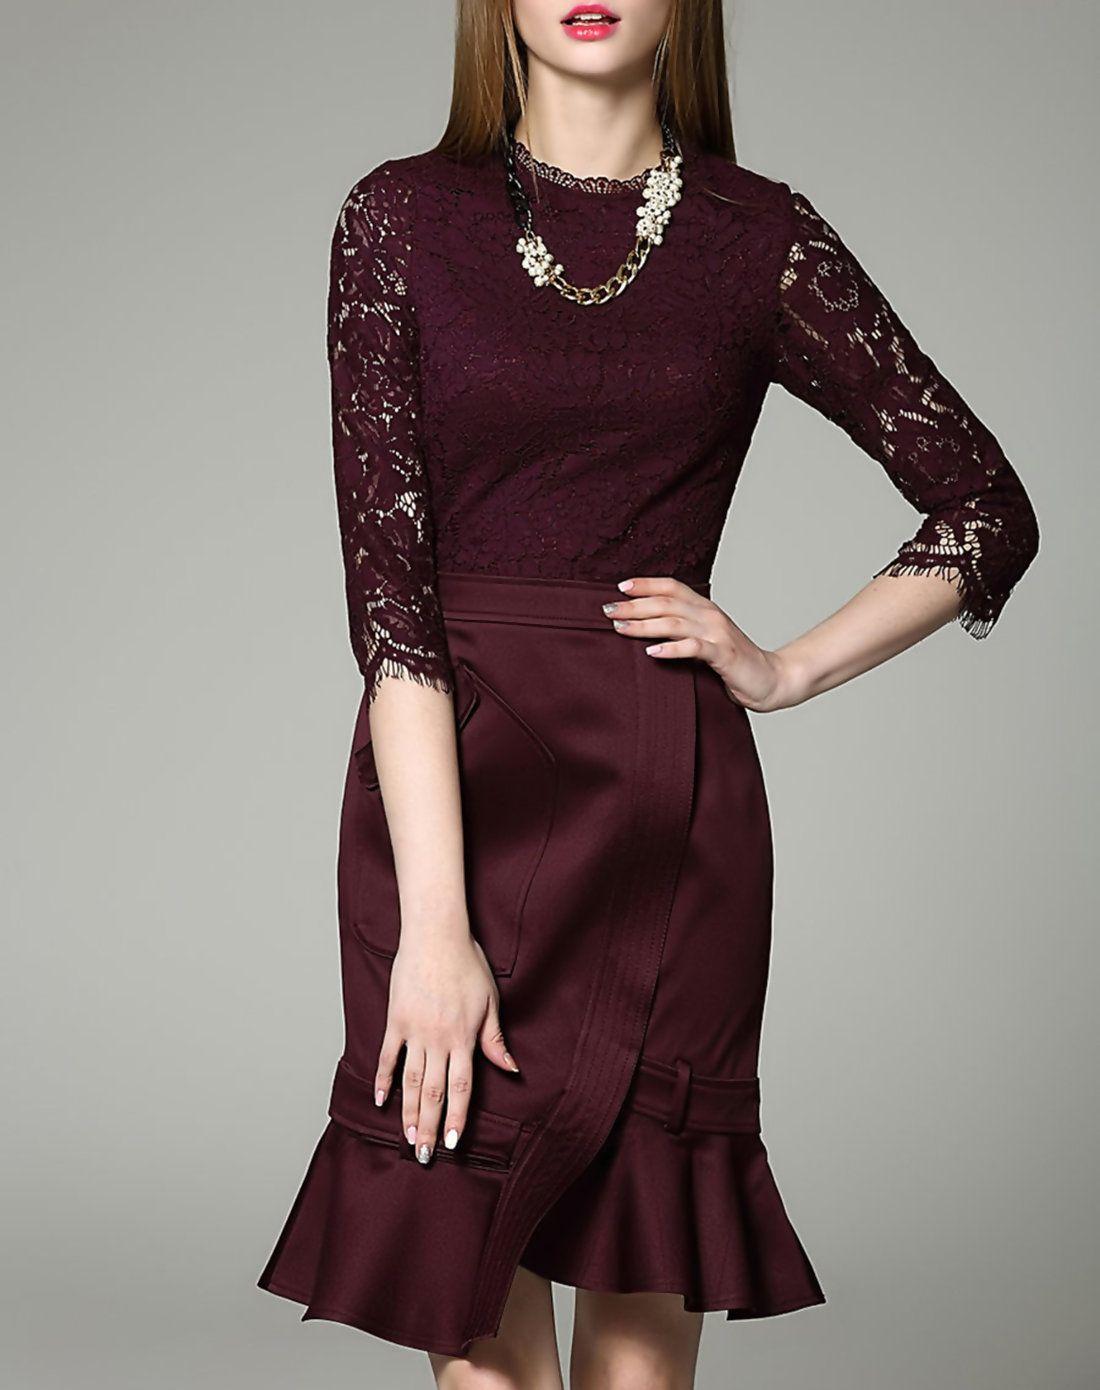 Adorewe charsu exquisite red stand collar half sleeve aline paneled